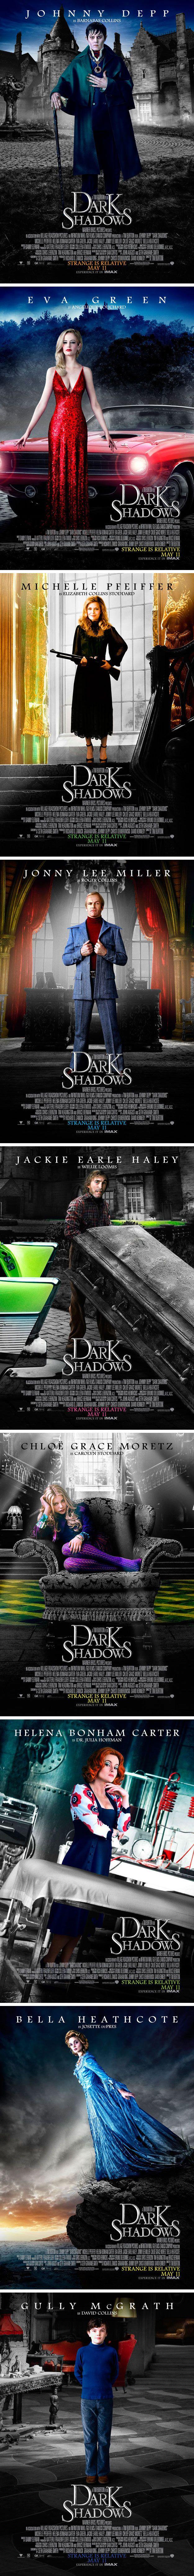 #DarkShadows Eva is so beautiful